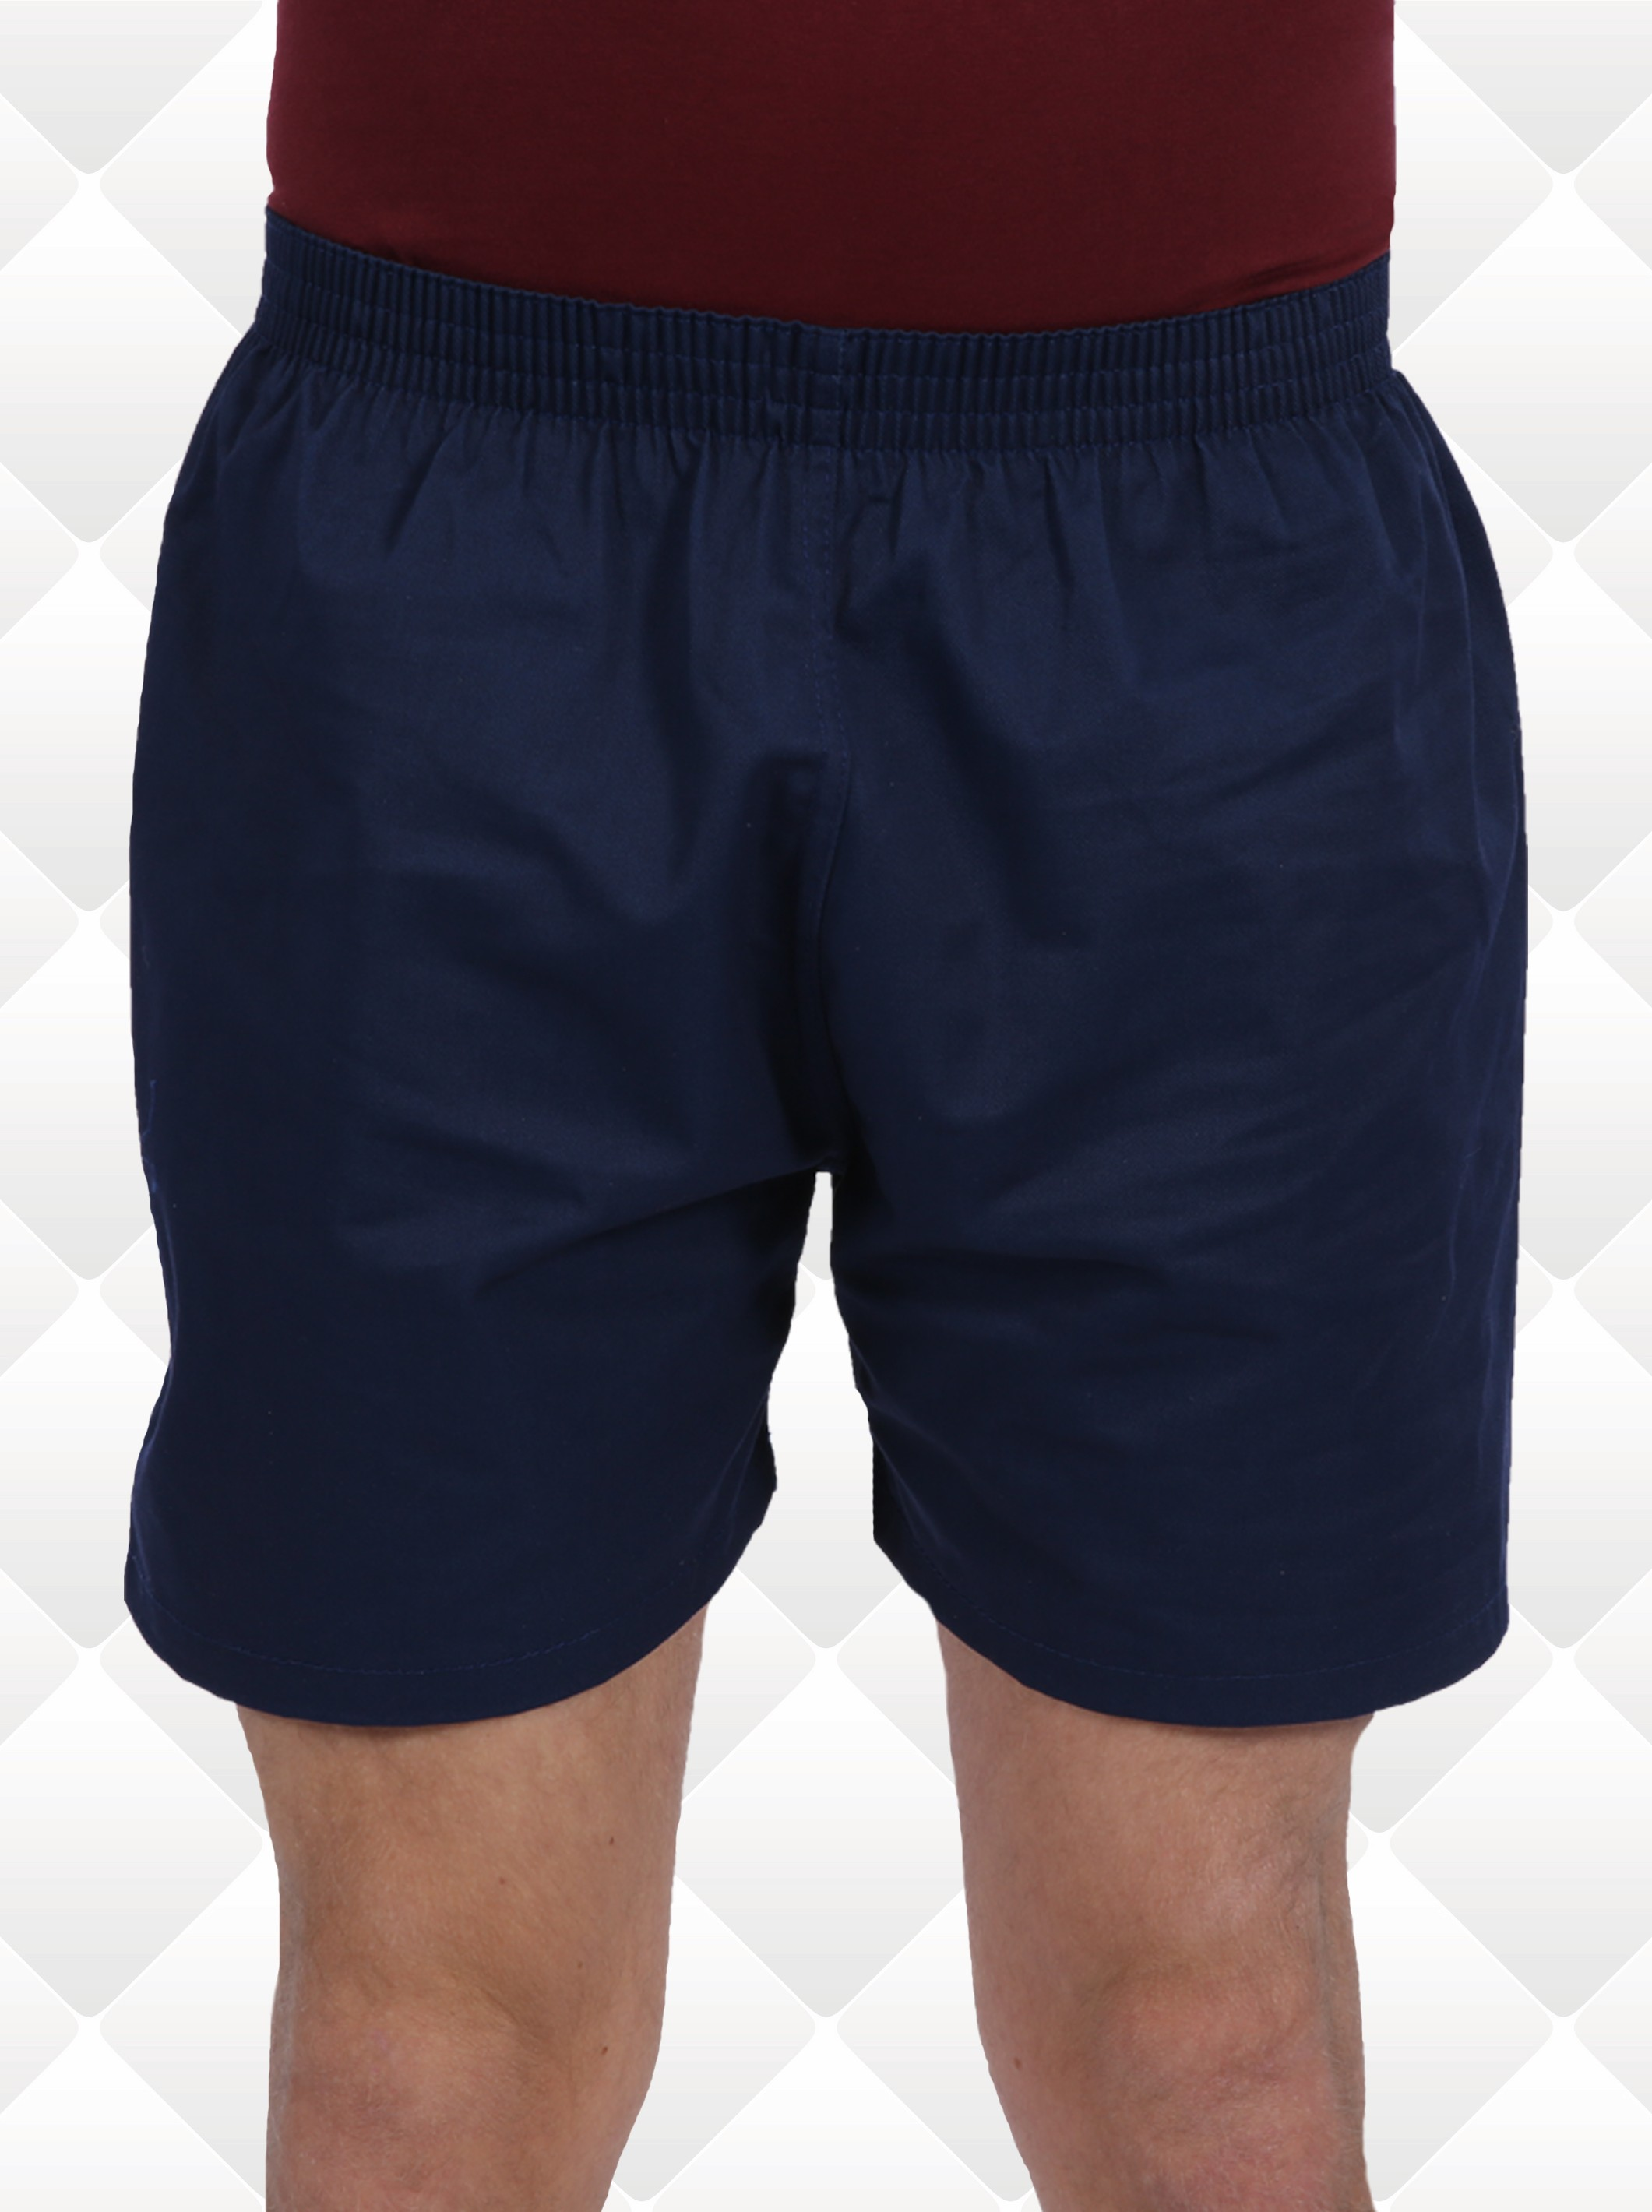 af662b32d Poly/Cotton P.E Shorts - Per 6 - Innovation Schoolwear